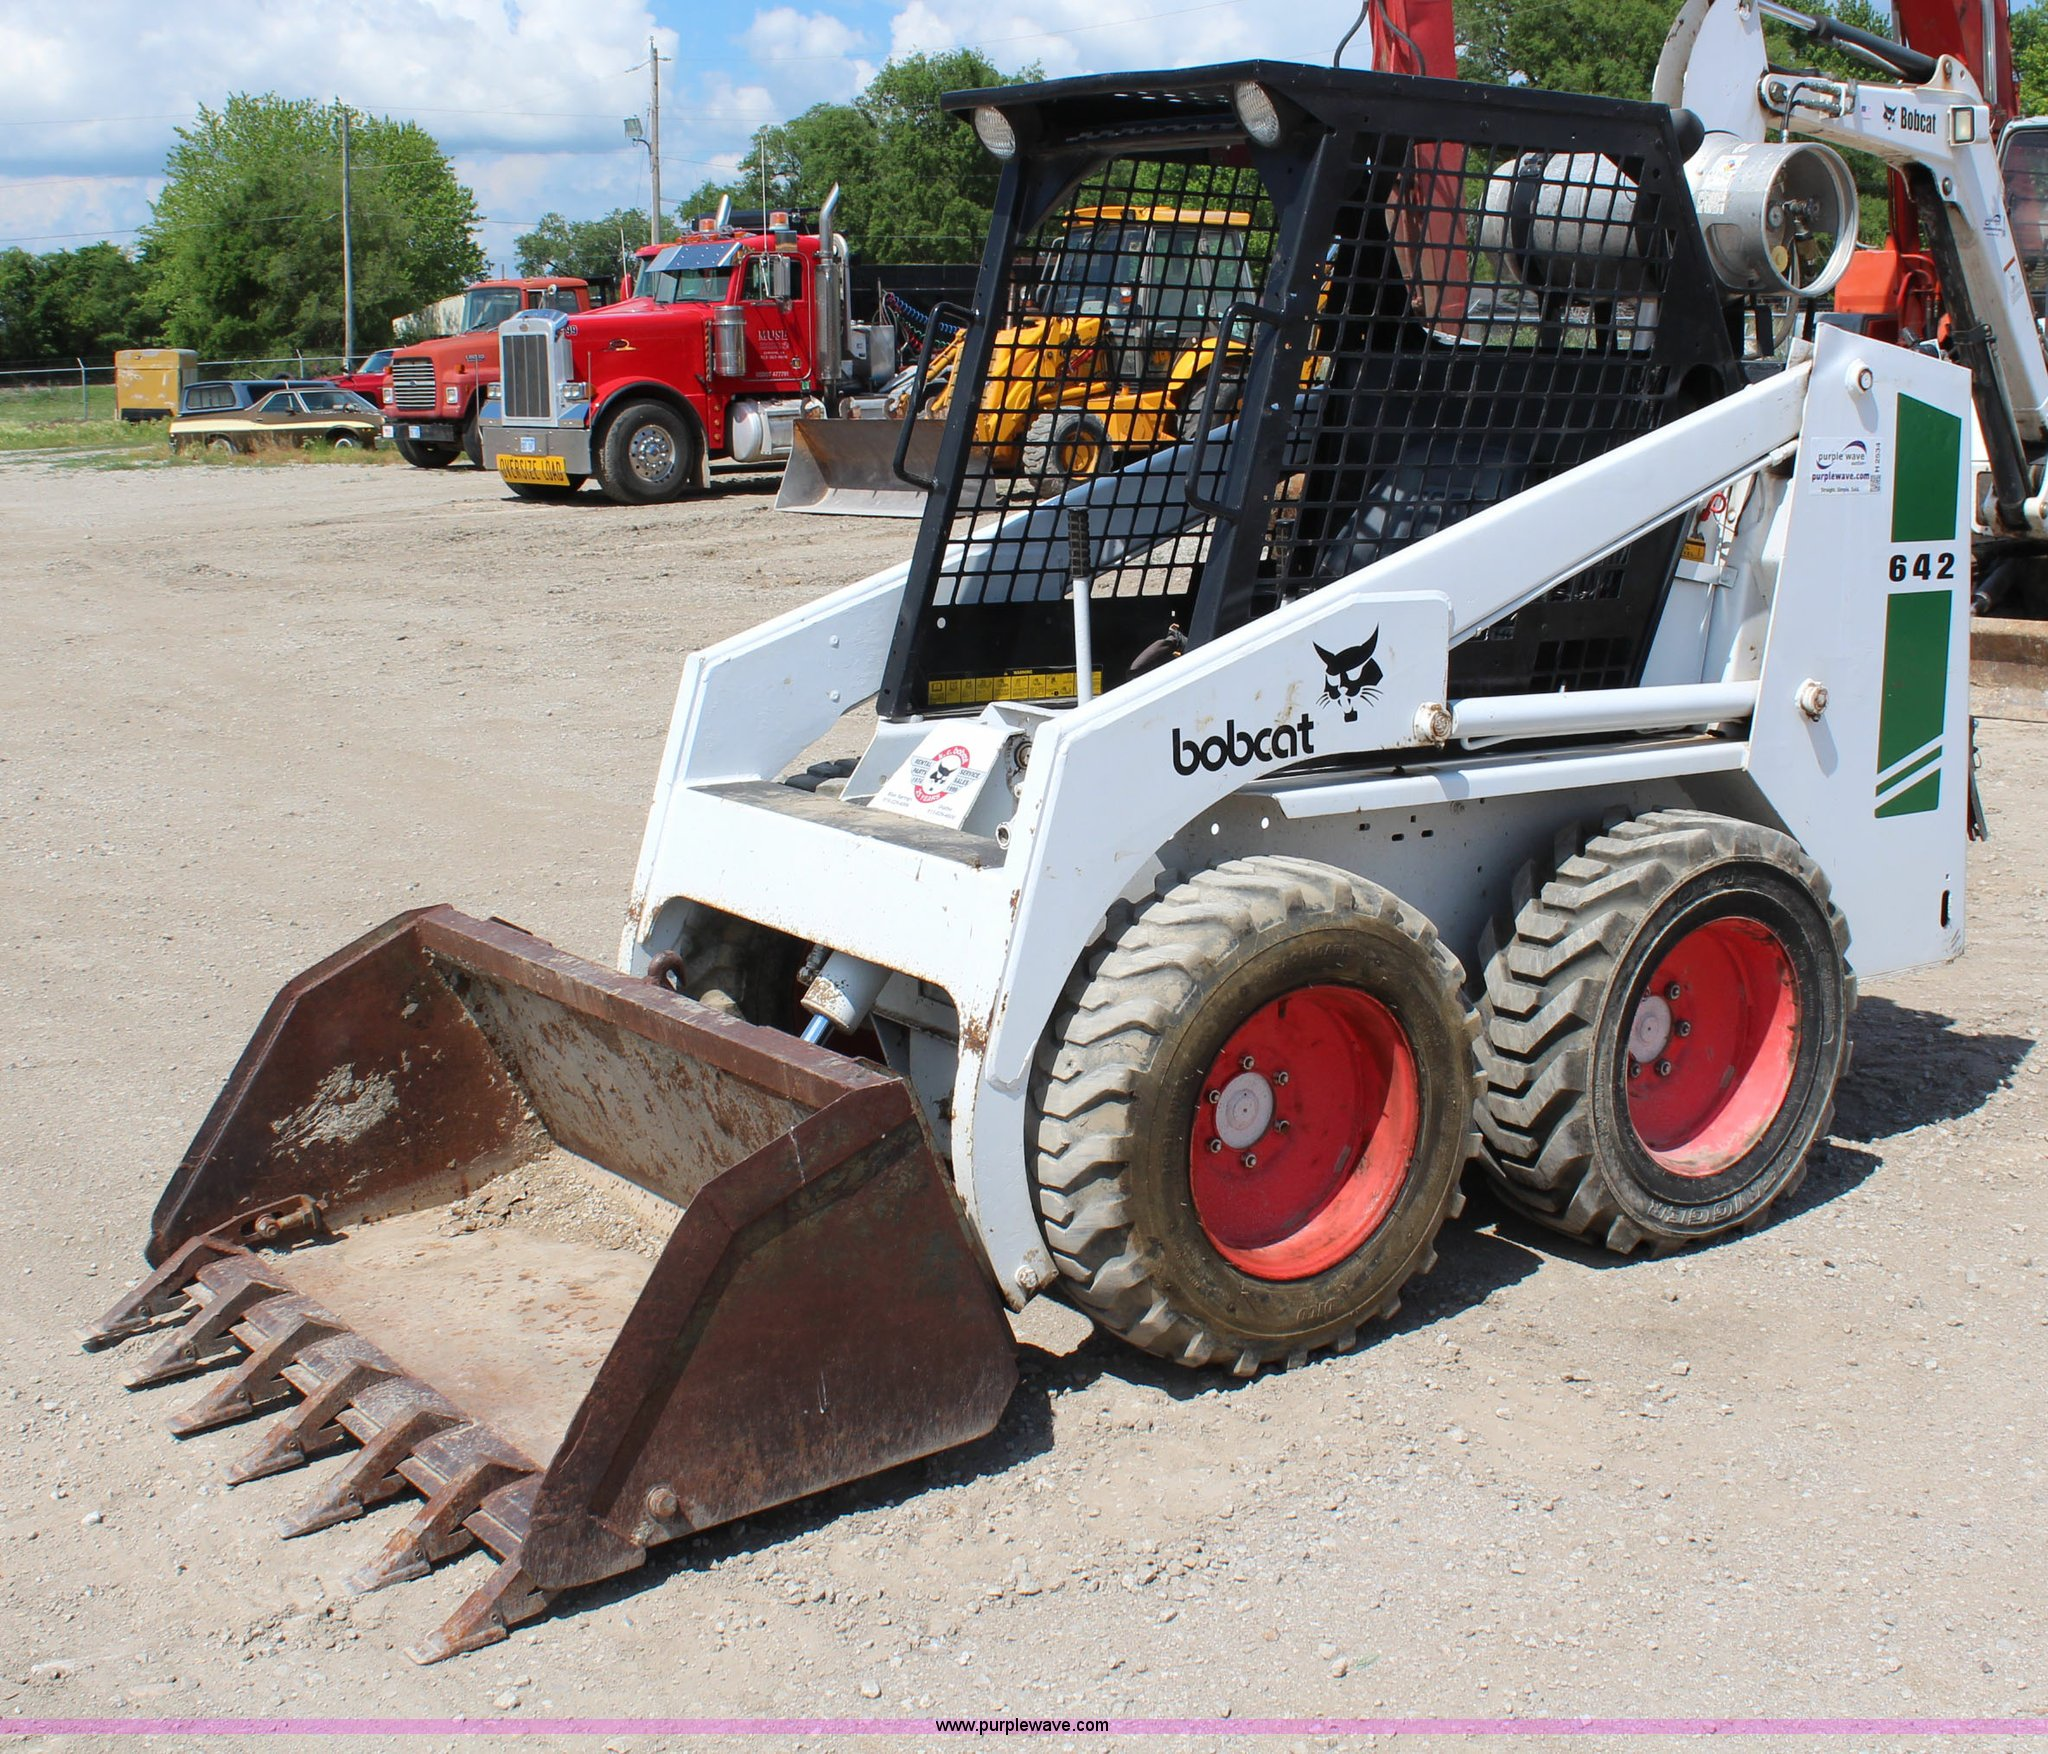 Bobcat 642 Parts Wiring Diagram Skid Steer Item Sold June Cons 2048x1754